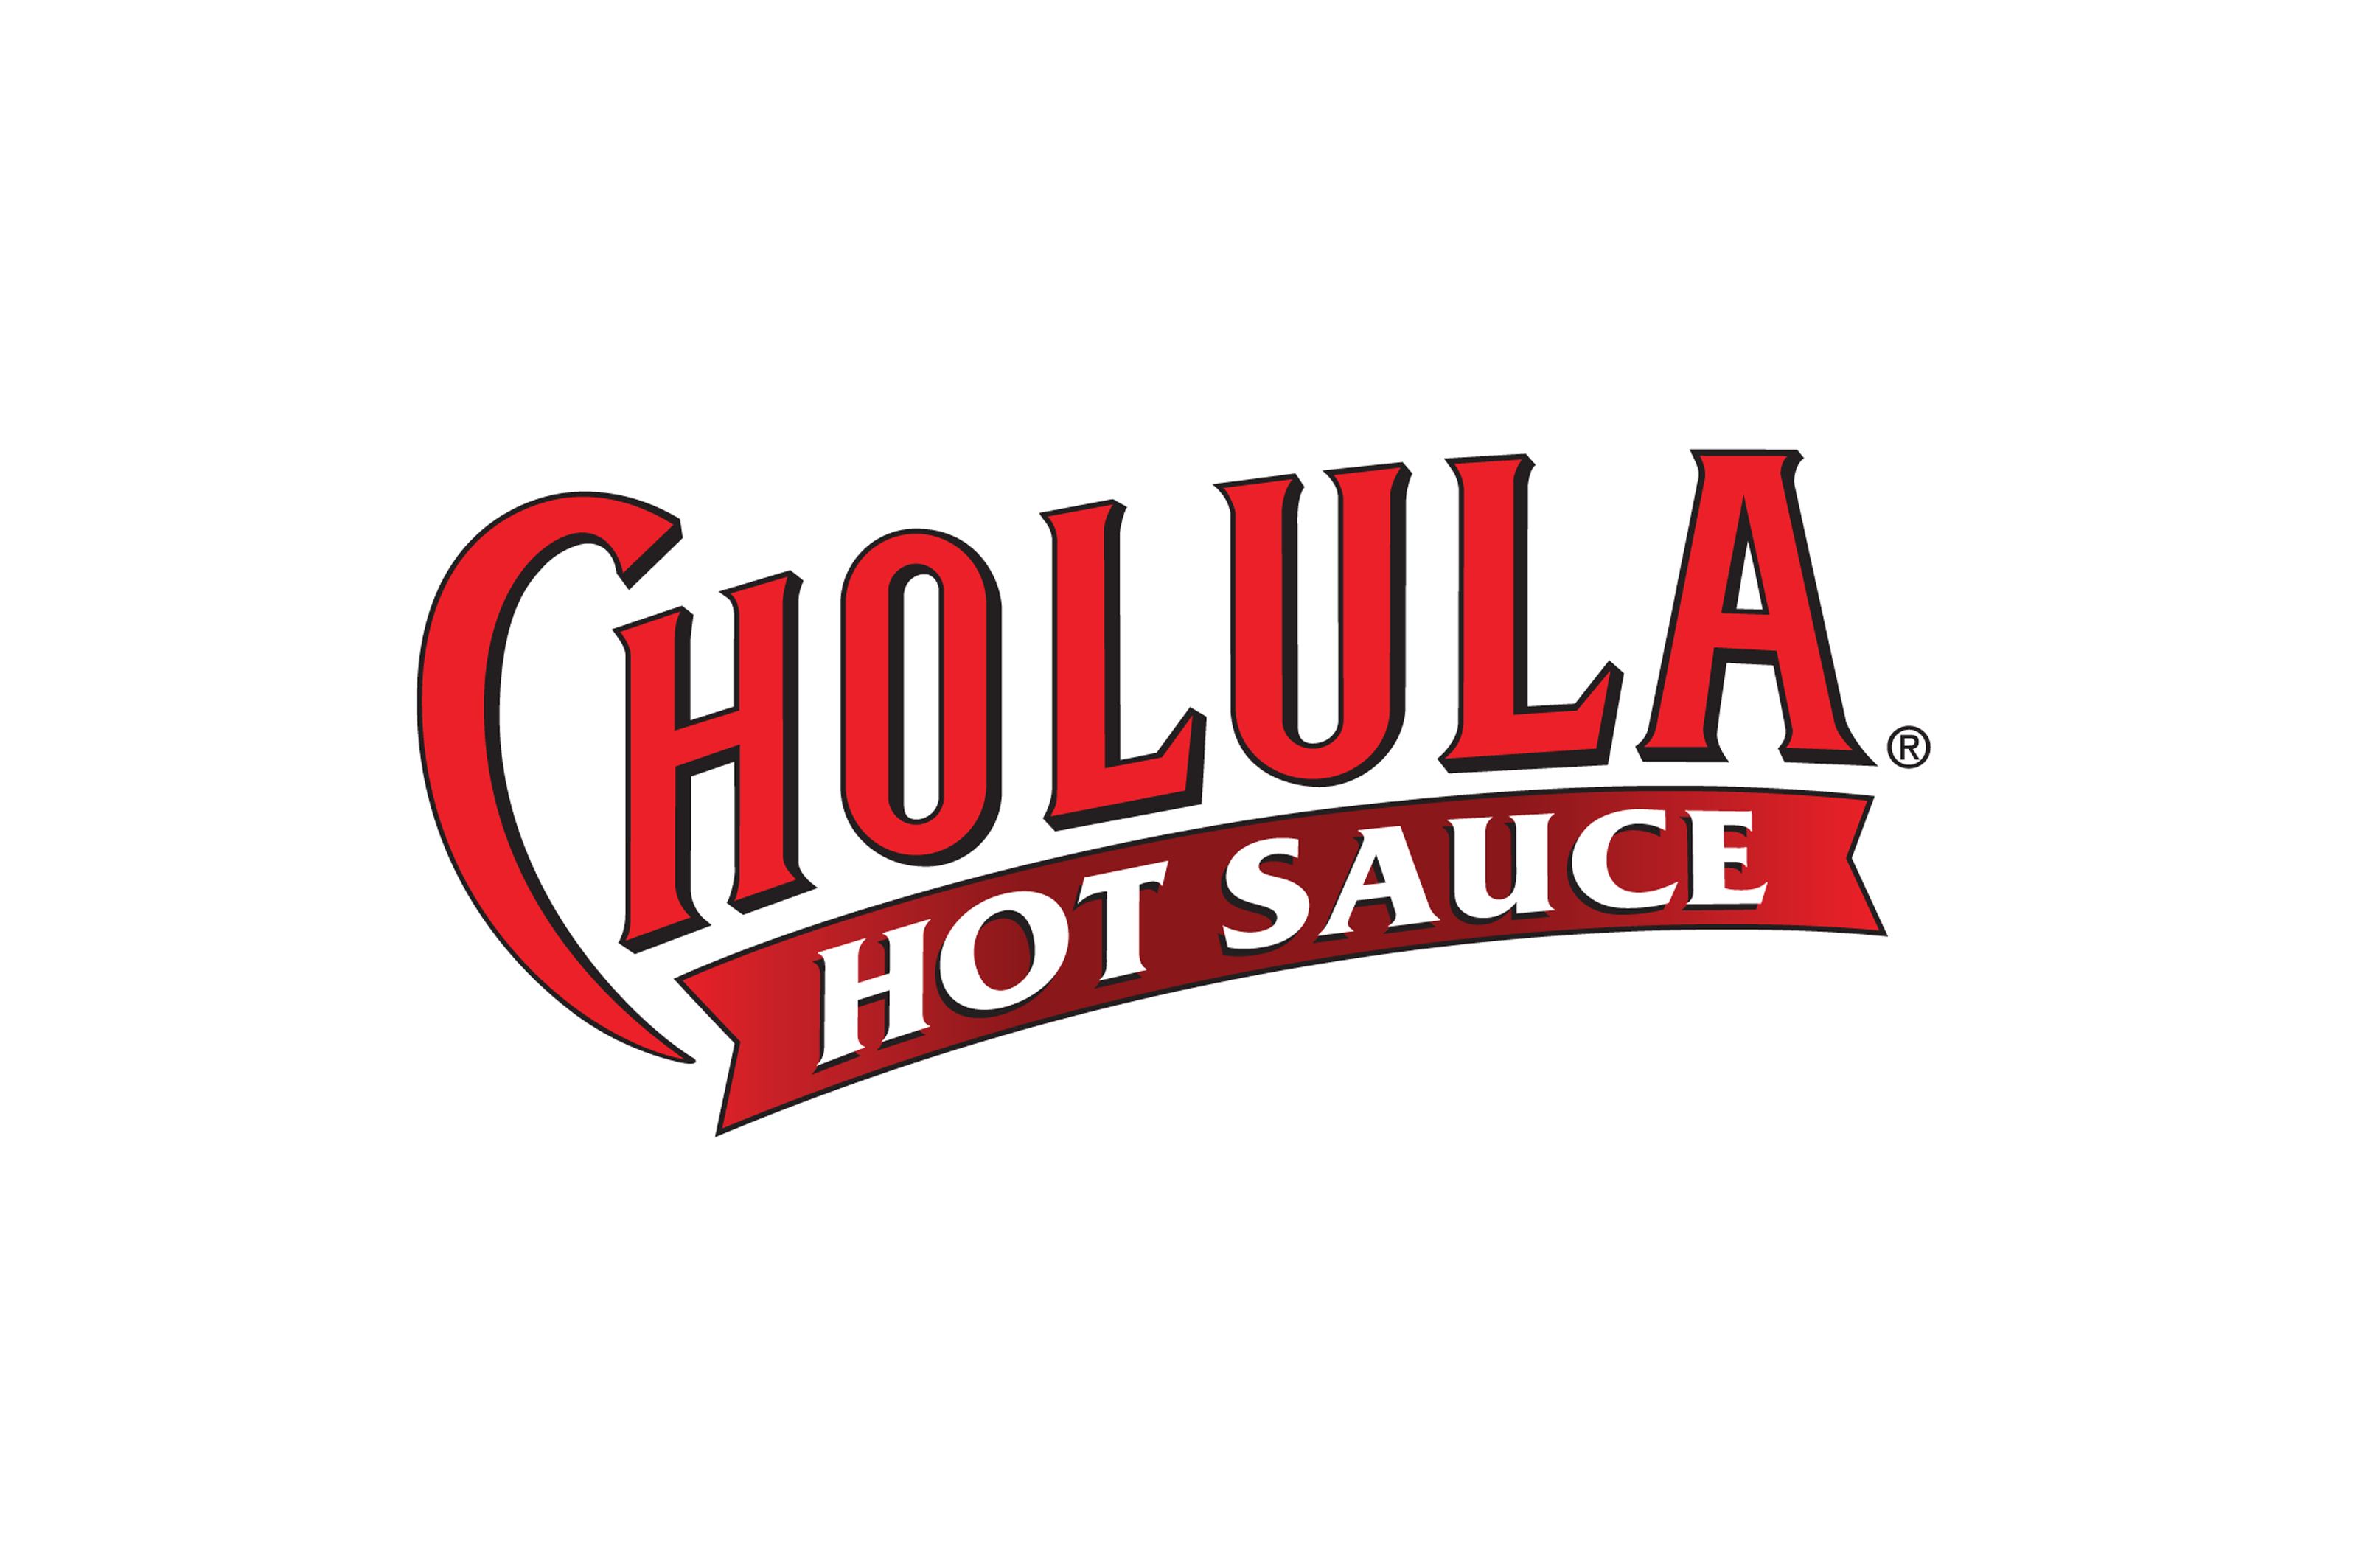 Cholula White